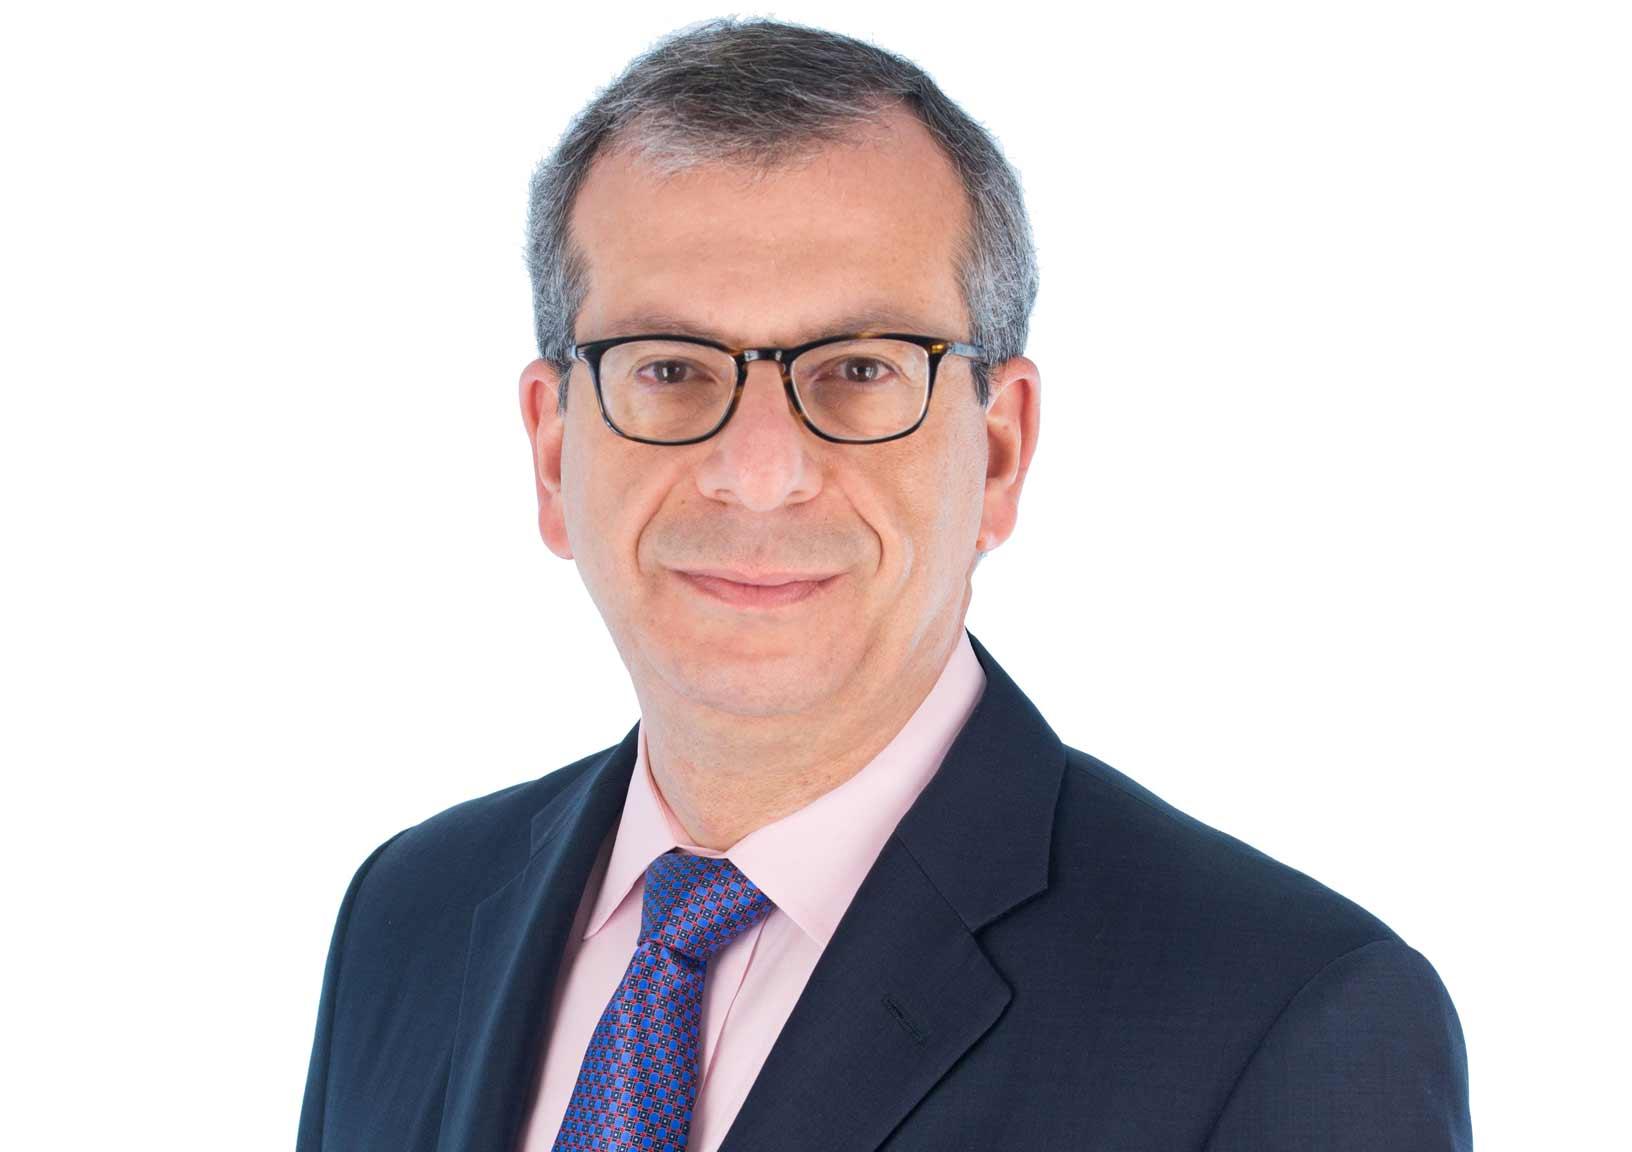 Peter Altabef